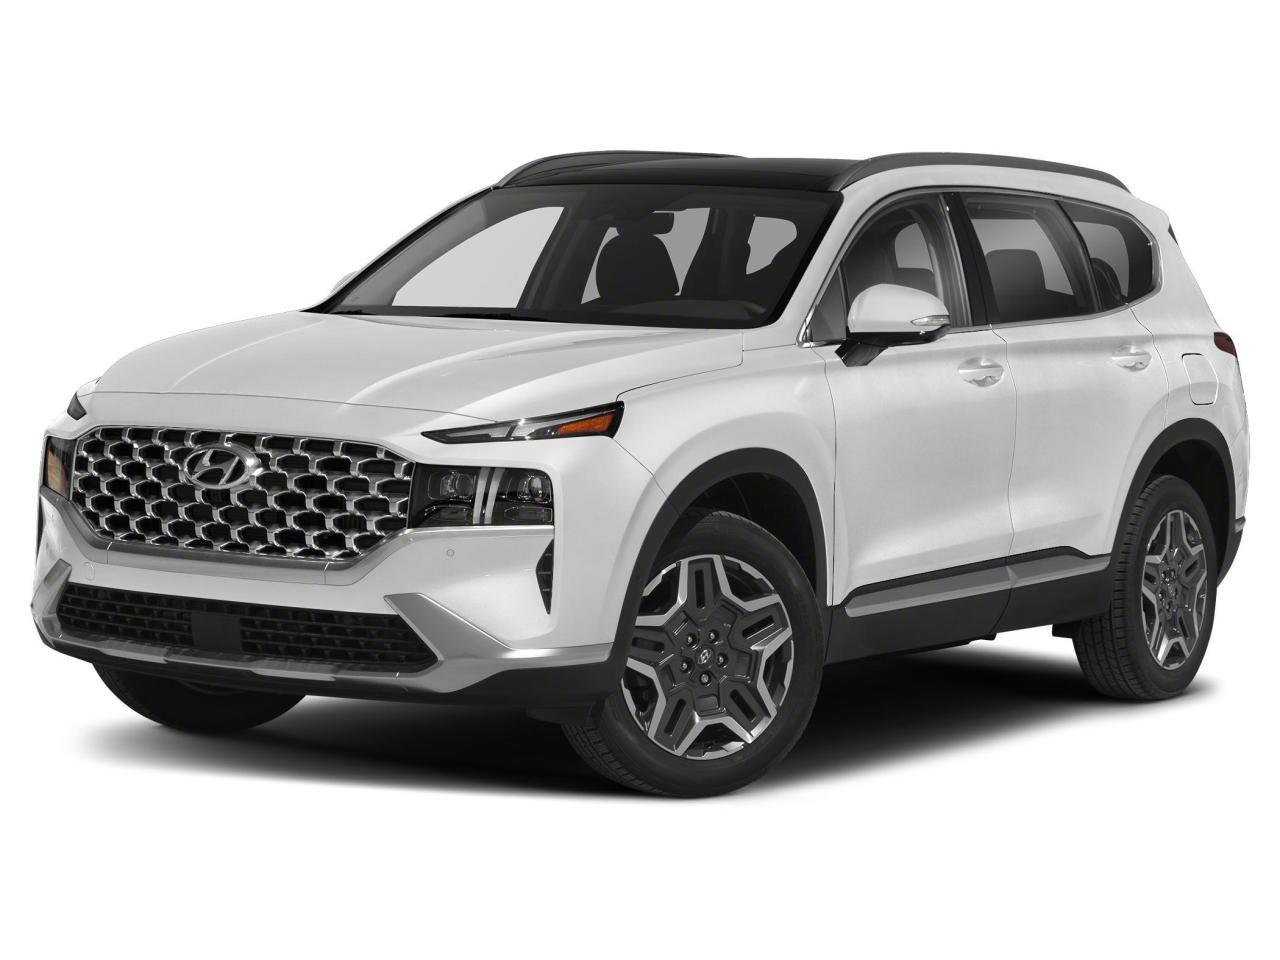 2022 Hyundai Santa Fe 1.6T LUXURY HYBRID AWD NO OPTIONS